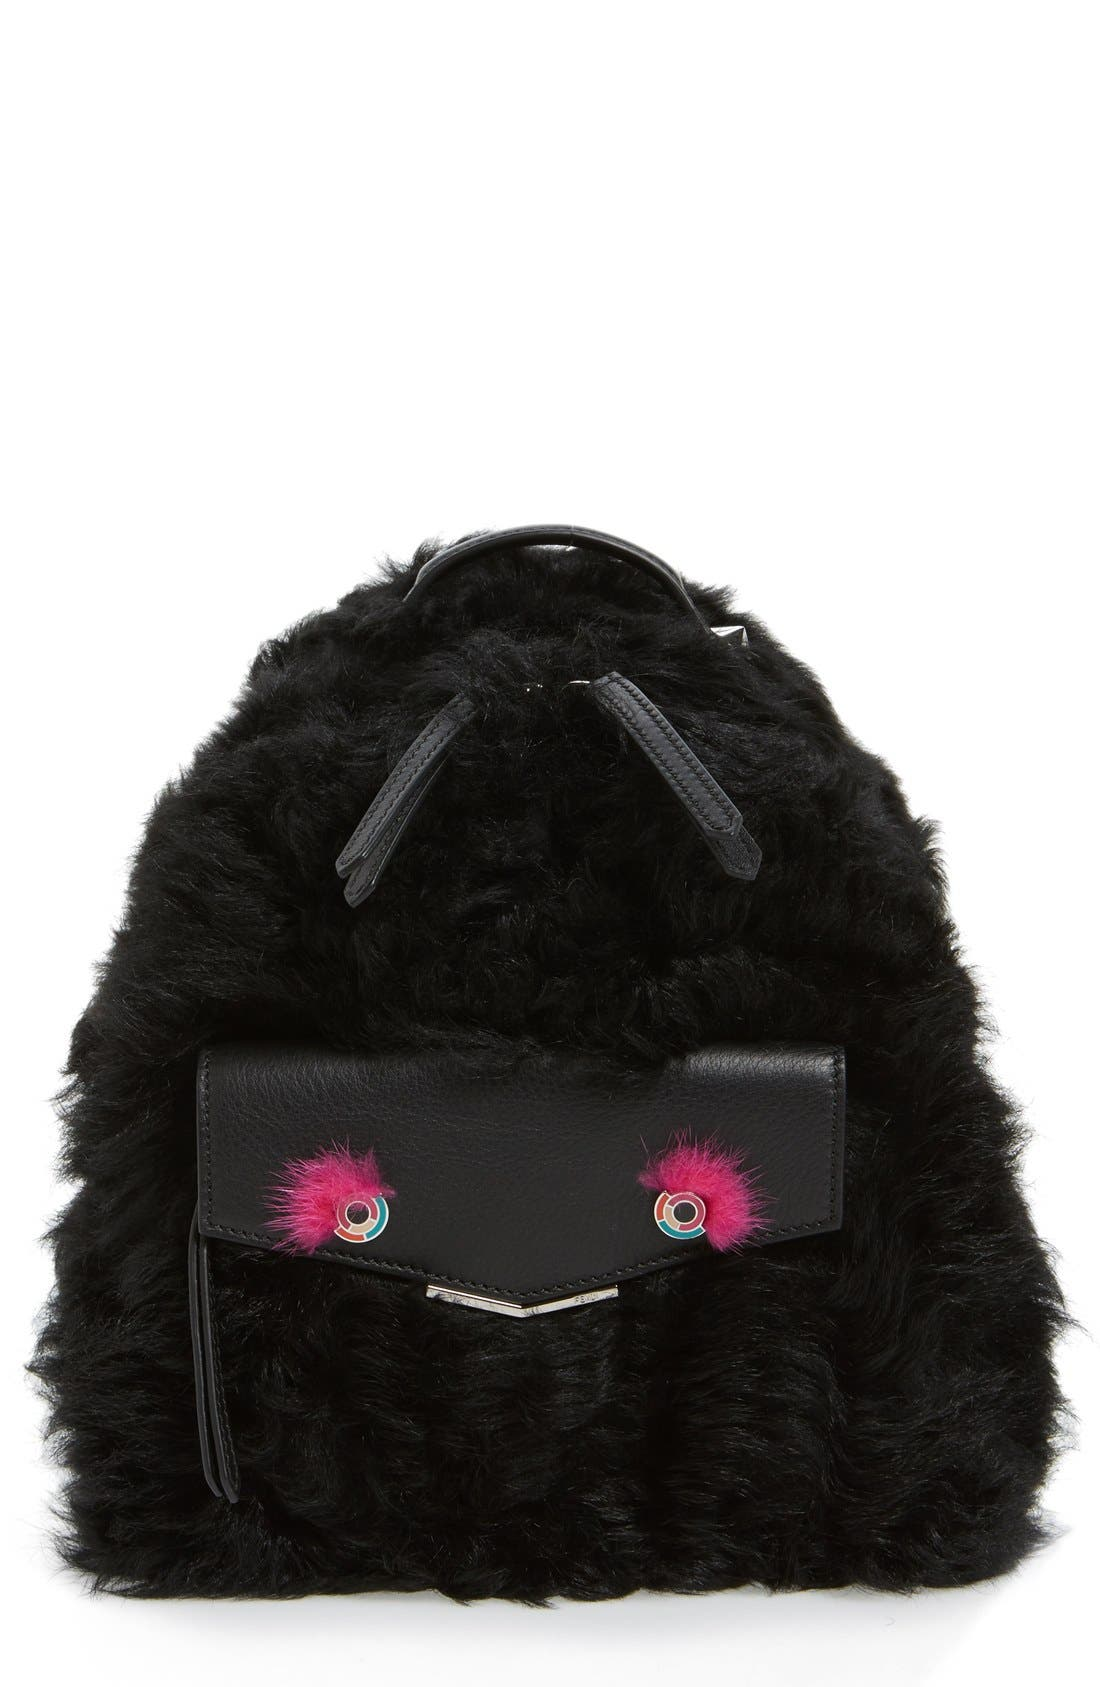 'Mini Monster' Genuine Shearling & Genuine Mink Fur Backpack - Black, Black/ Fuchsia / Palladium